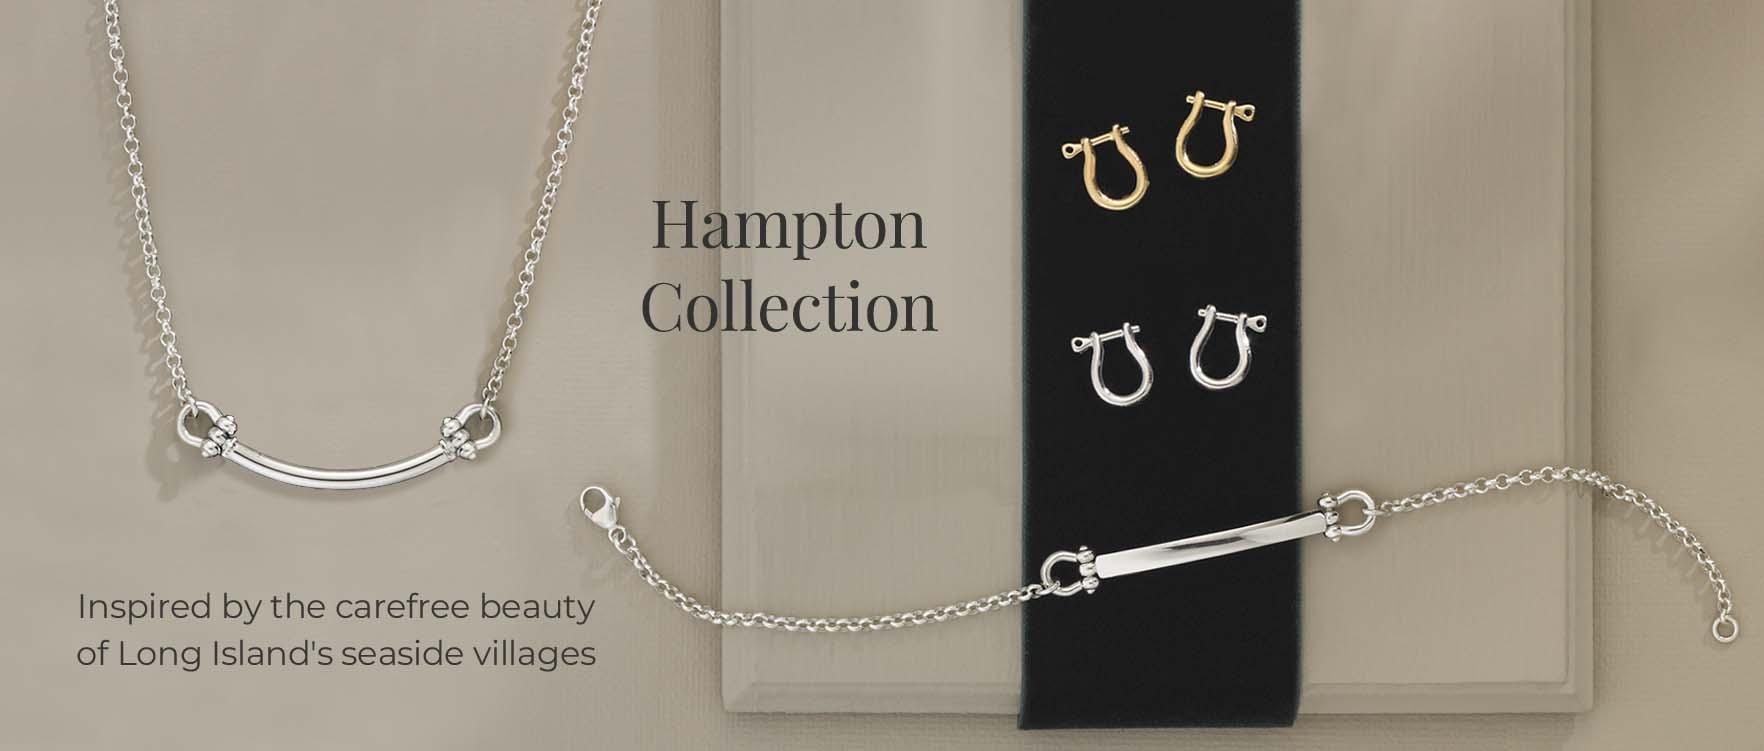 hampton-collection-2.jpg